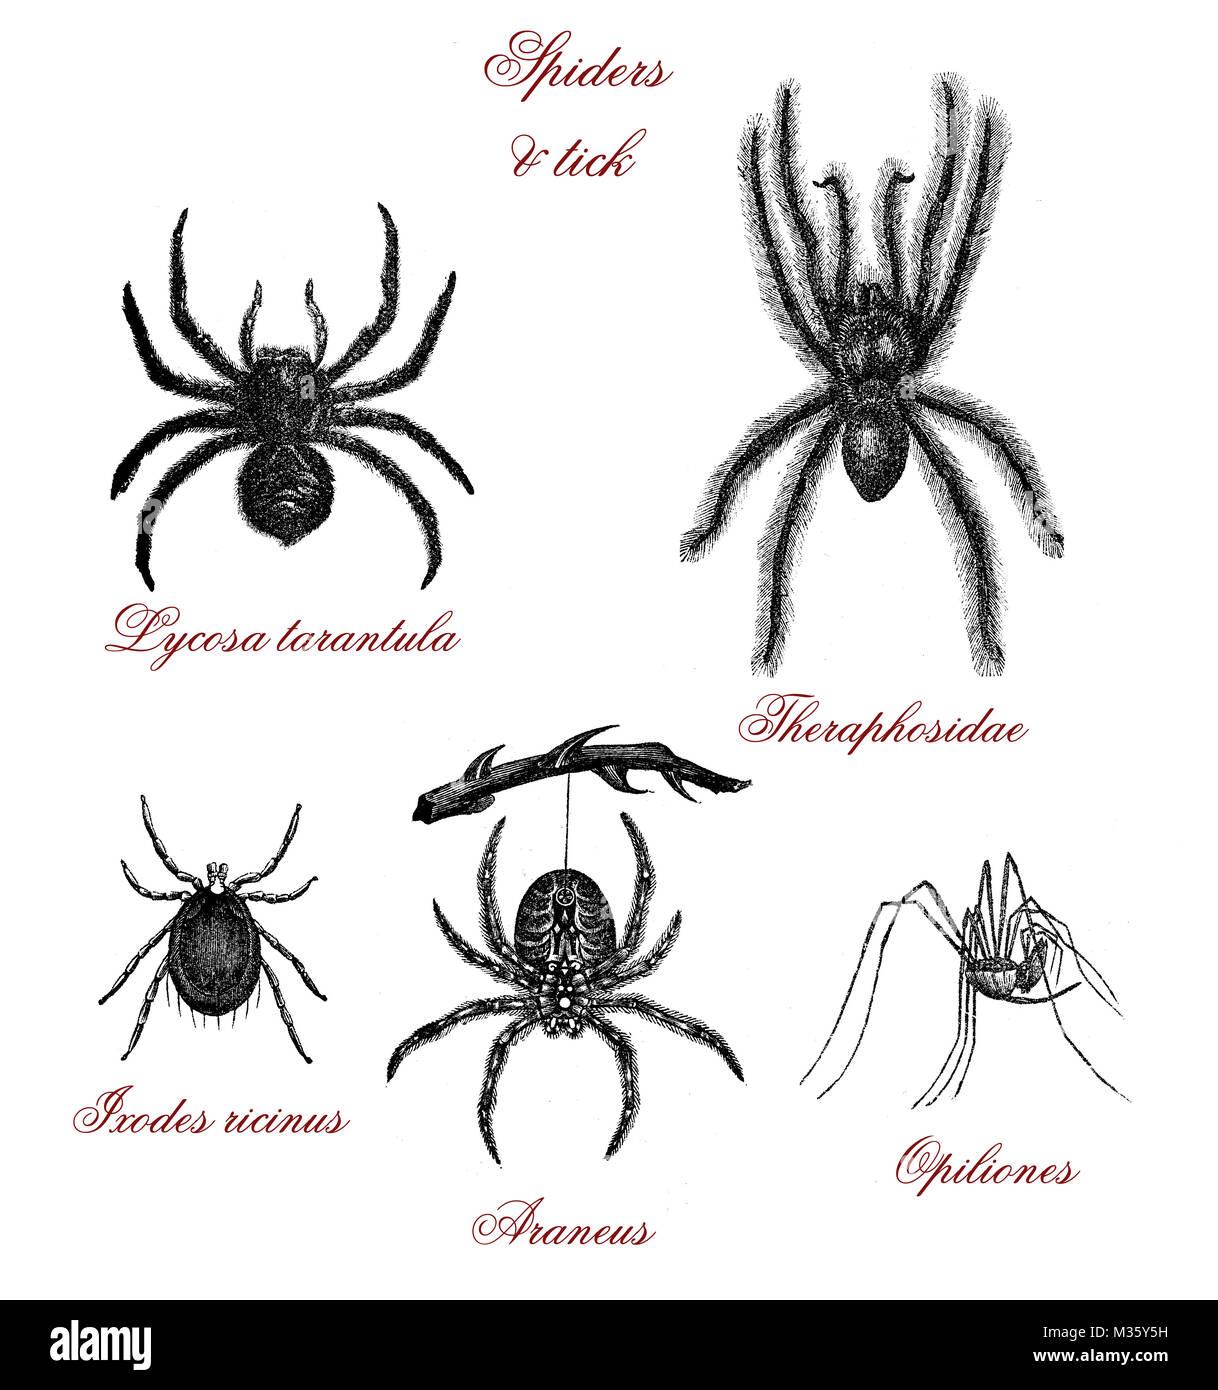 Vintage illustration, table with different kind of spiders: tarantua,tick, - Stock Image